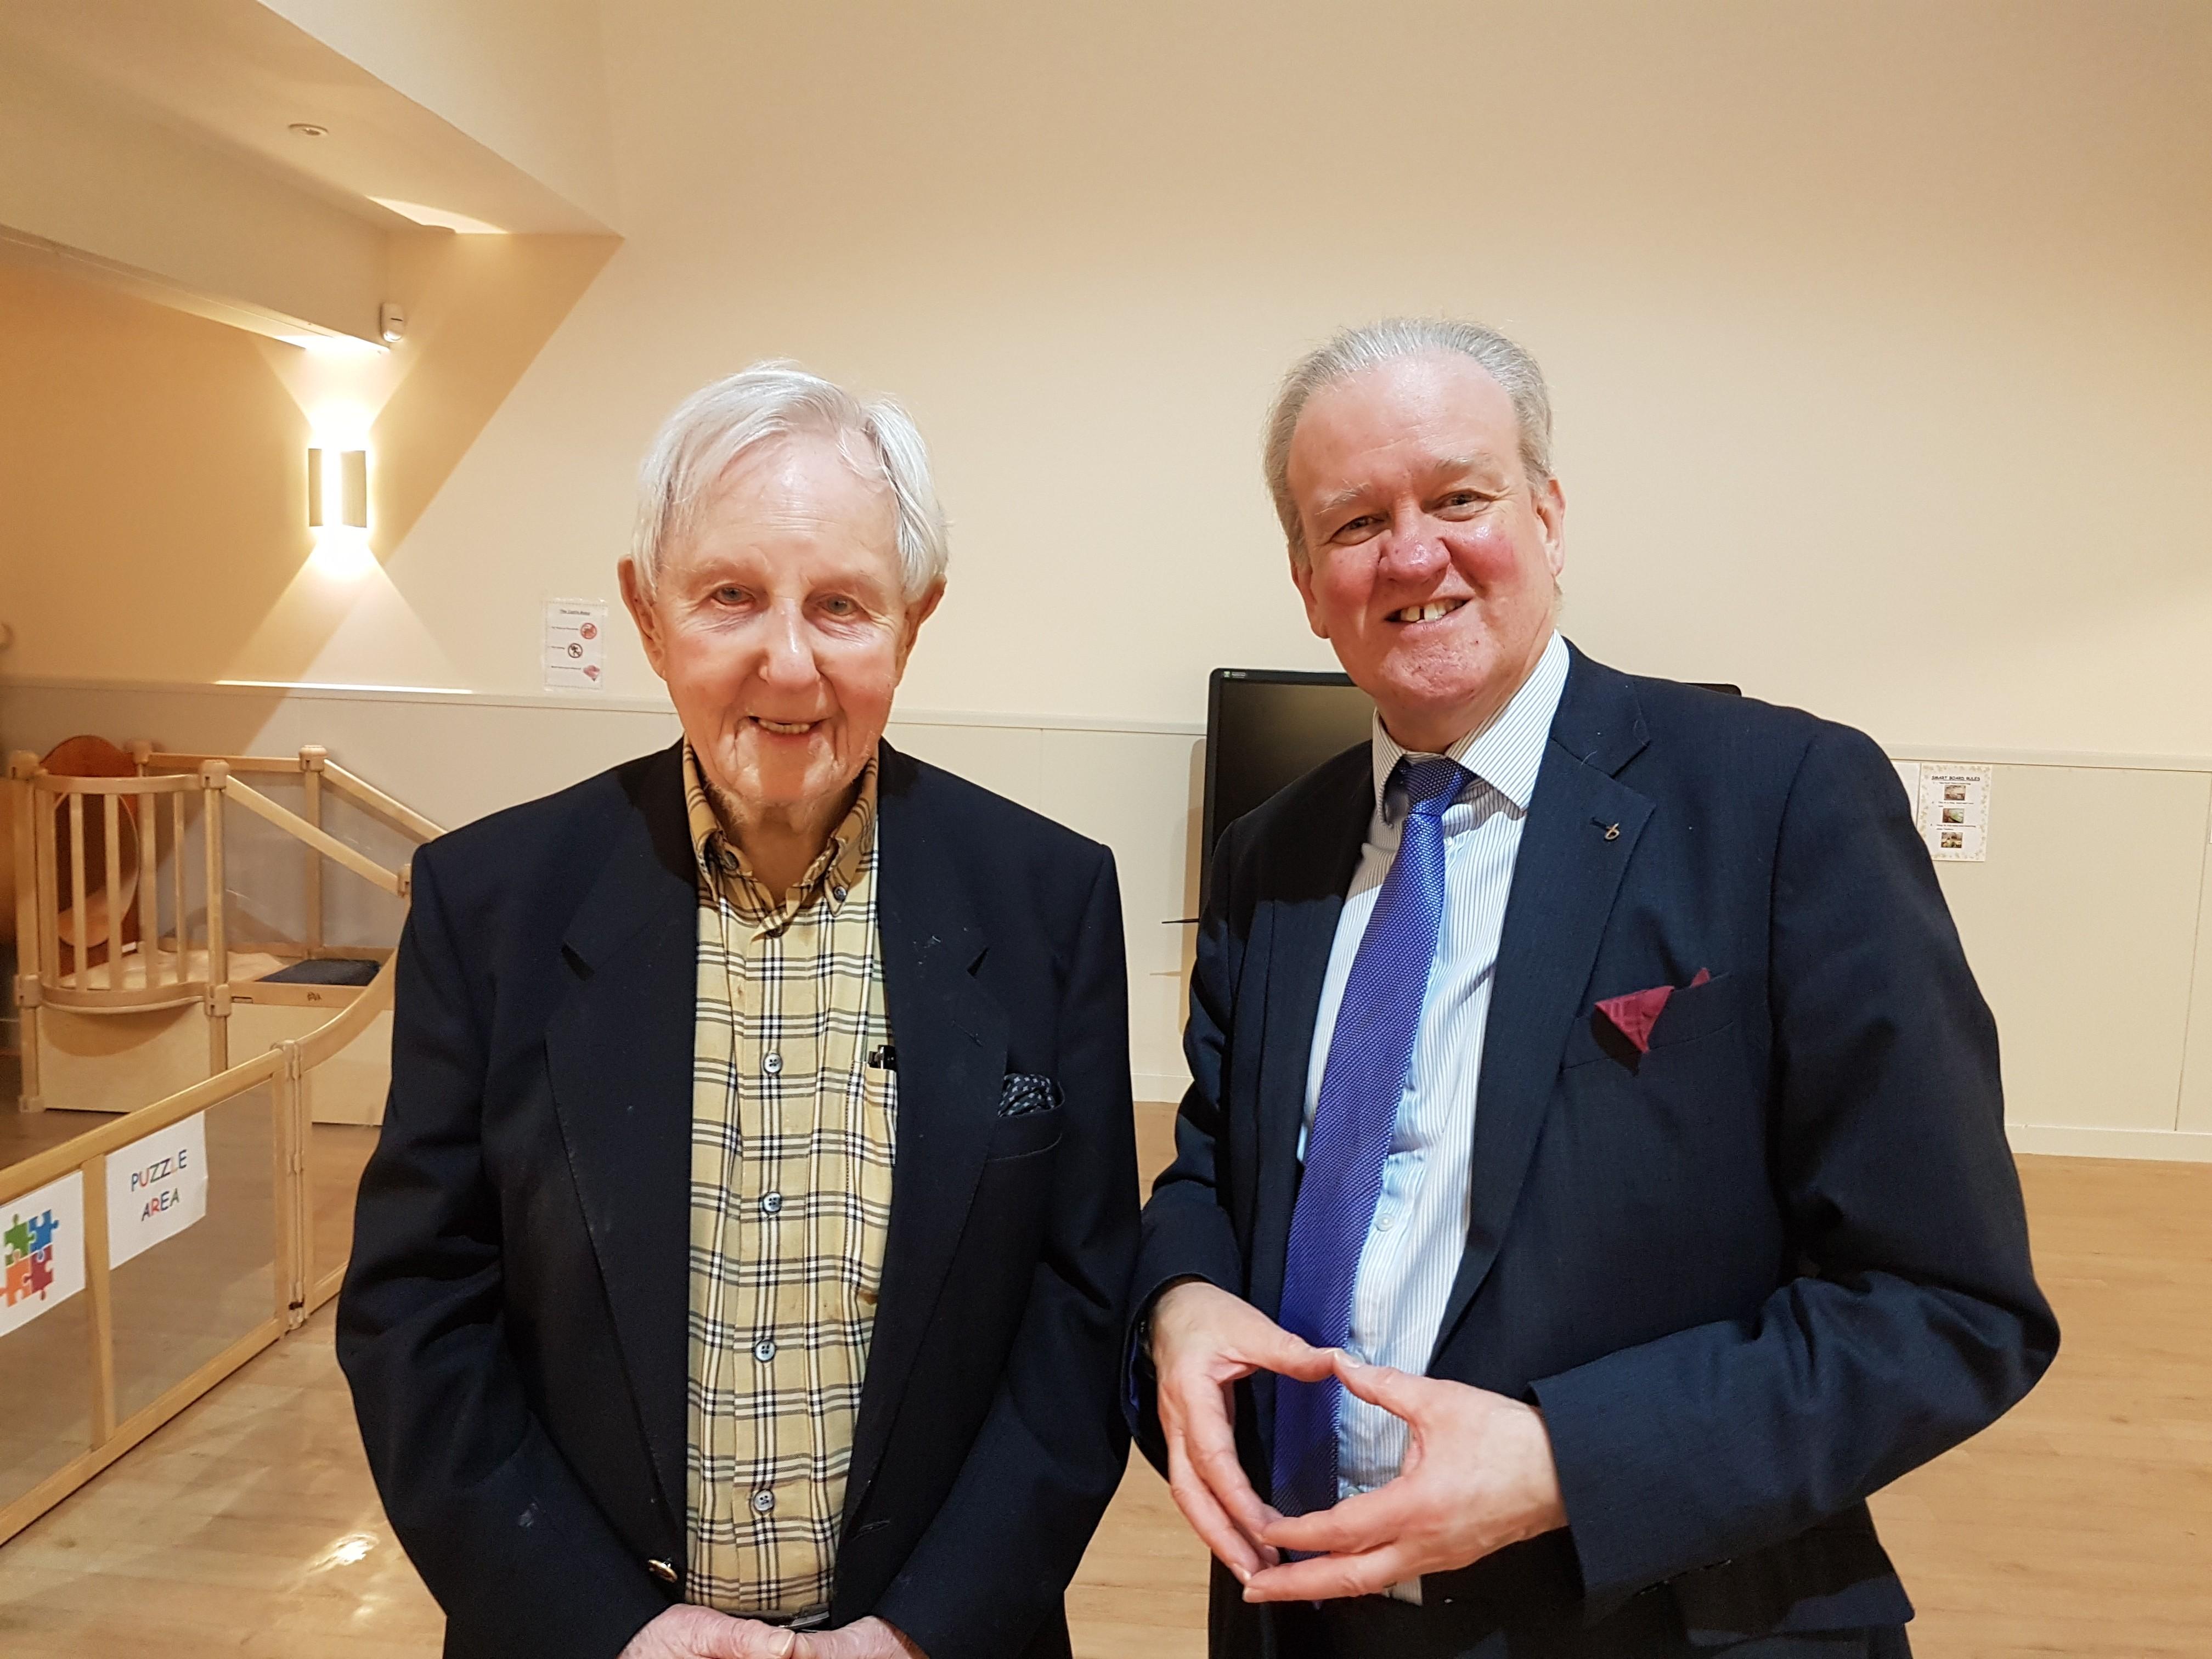 Norman Allan and Stewart Stevenson